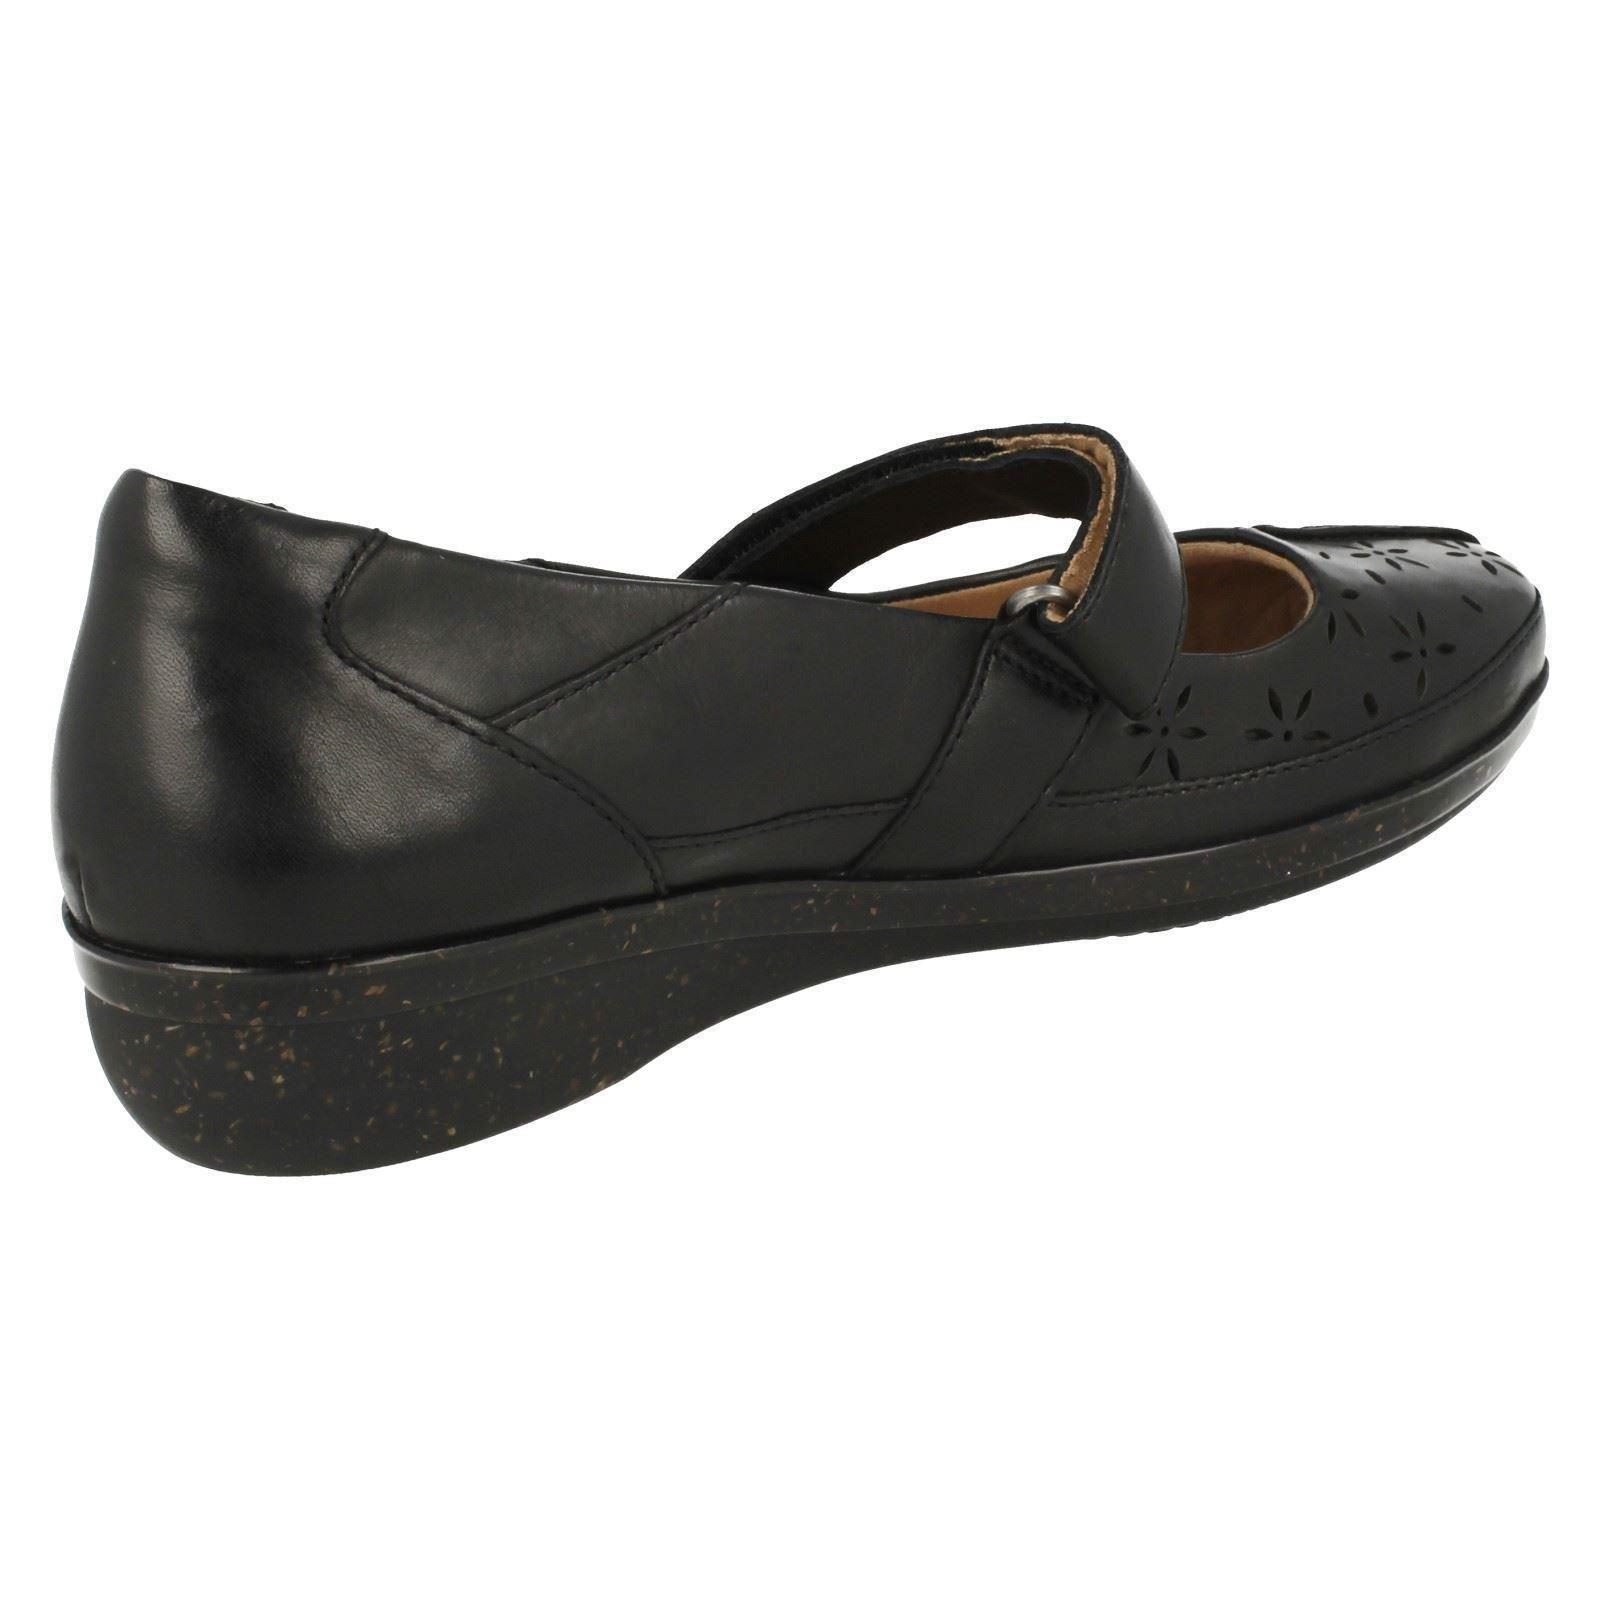 Damas Clarks Zapatos Informales Suave Cojín Estilo-everlay Bai